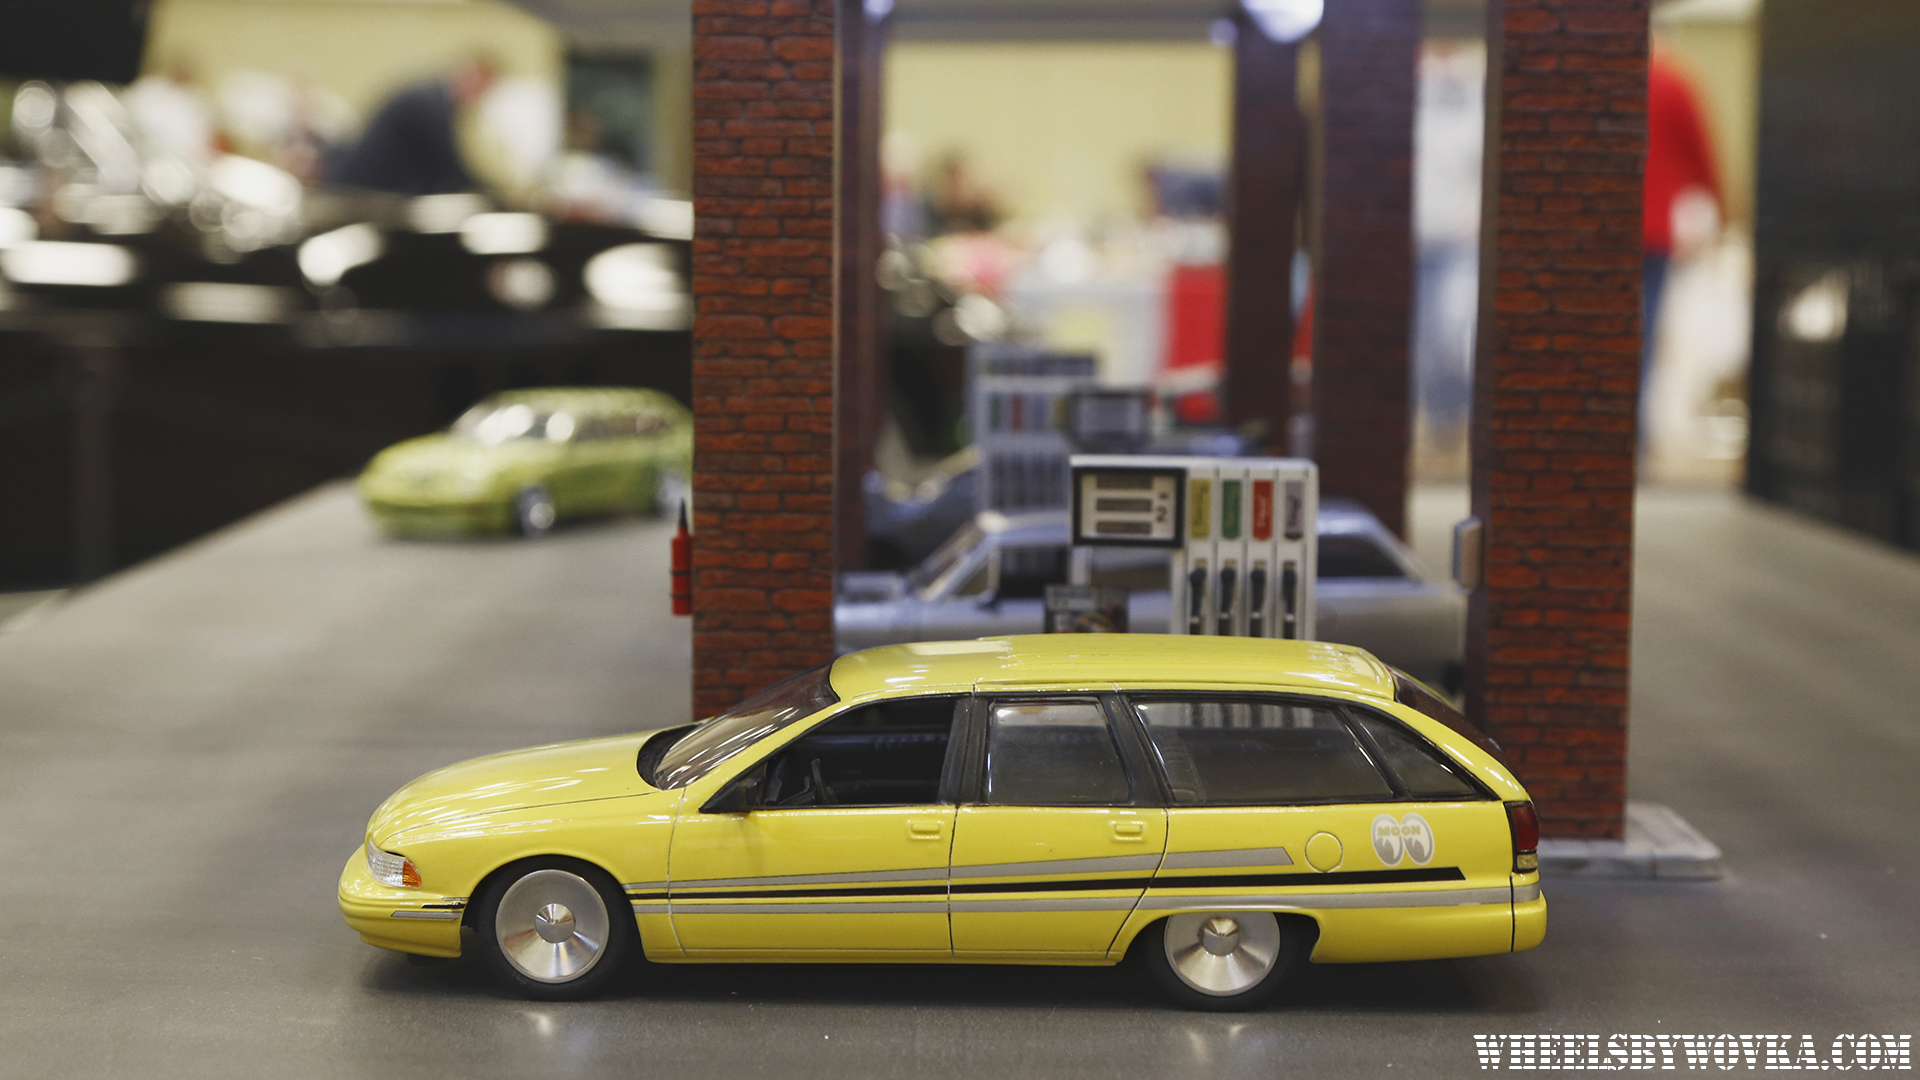 model-car-show-frankfurt-2017-136